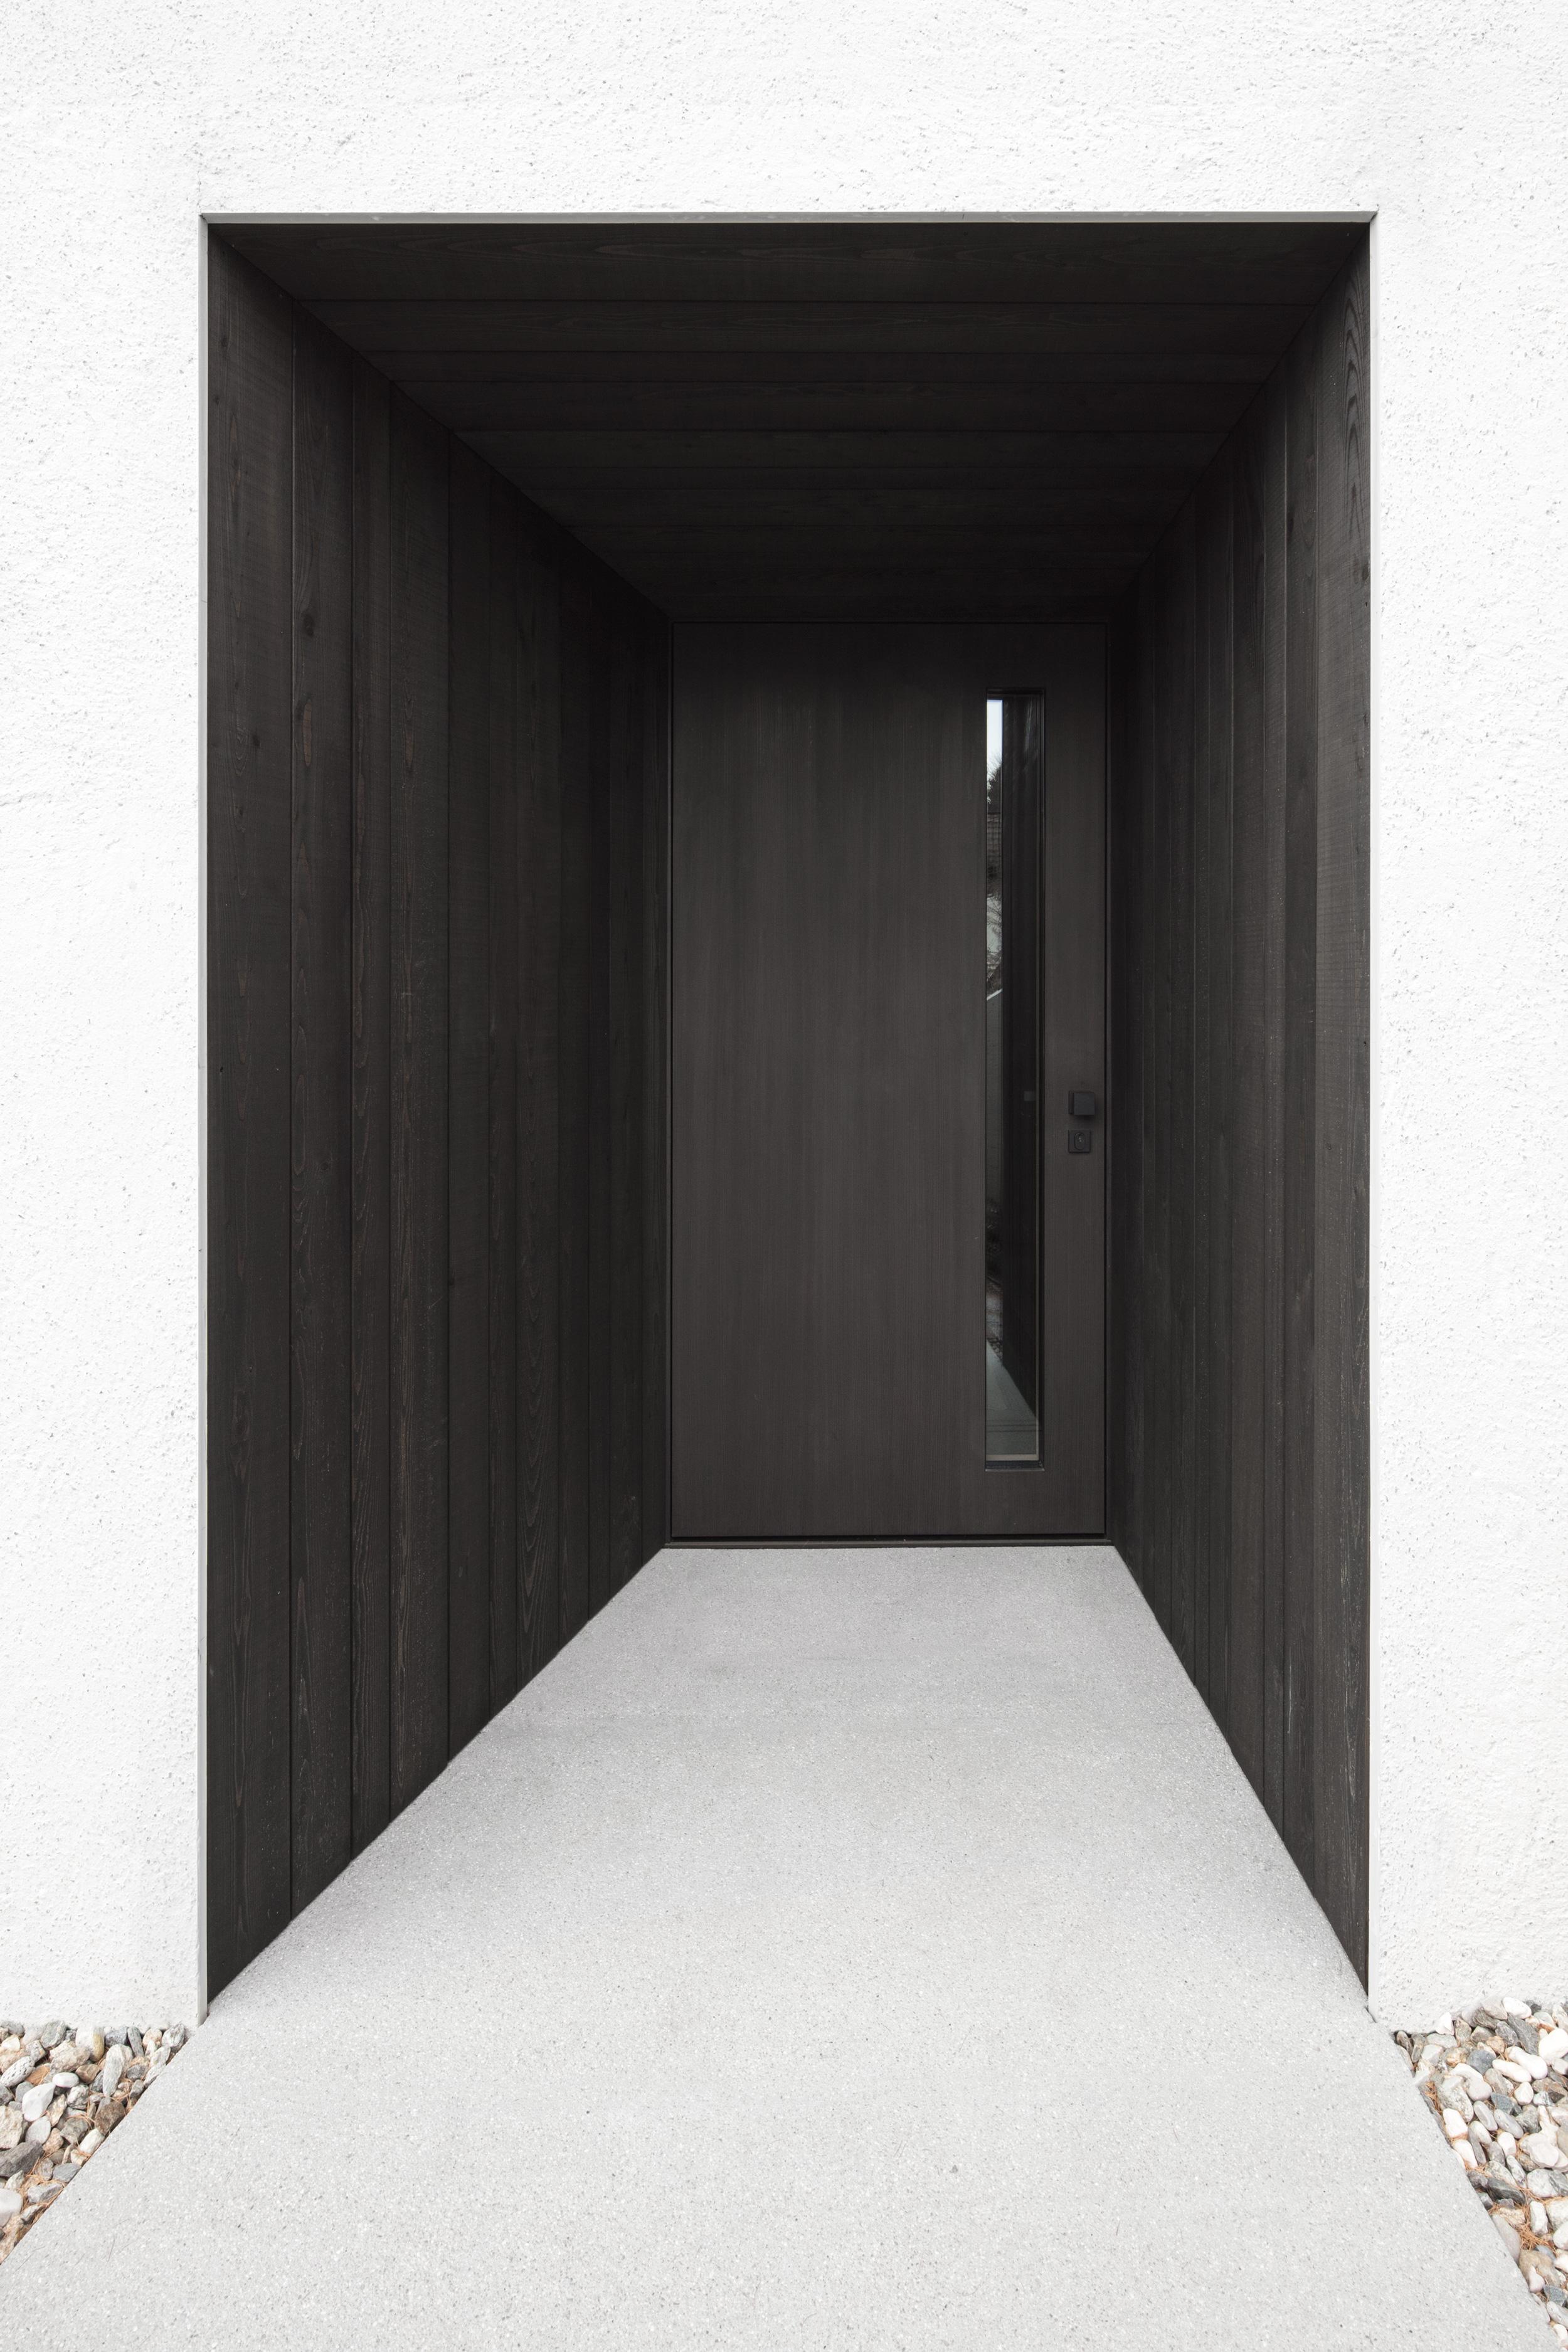 Comfort_Arch-Dietenheim-1_IMG_4615_GW.jpg